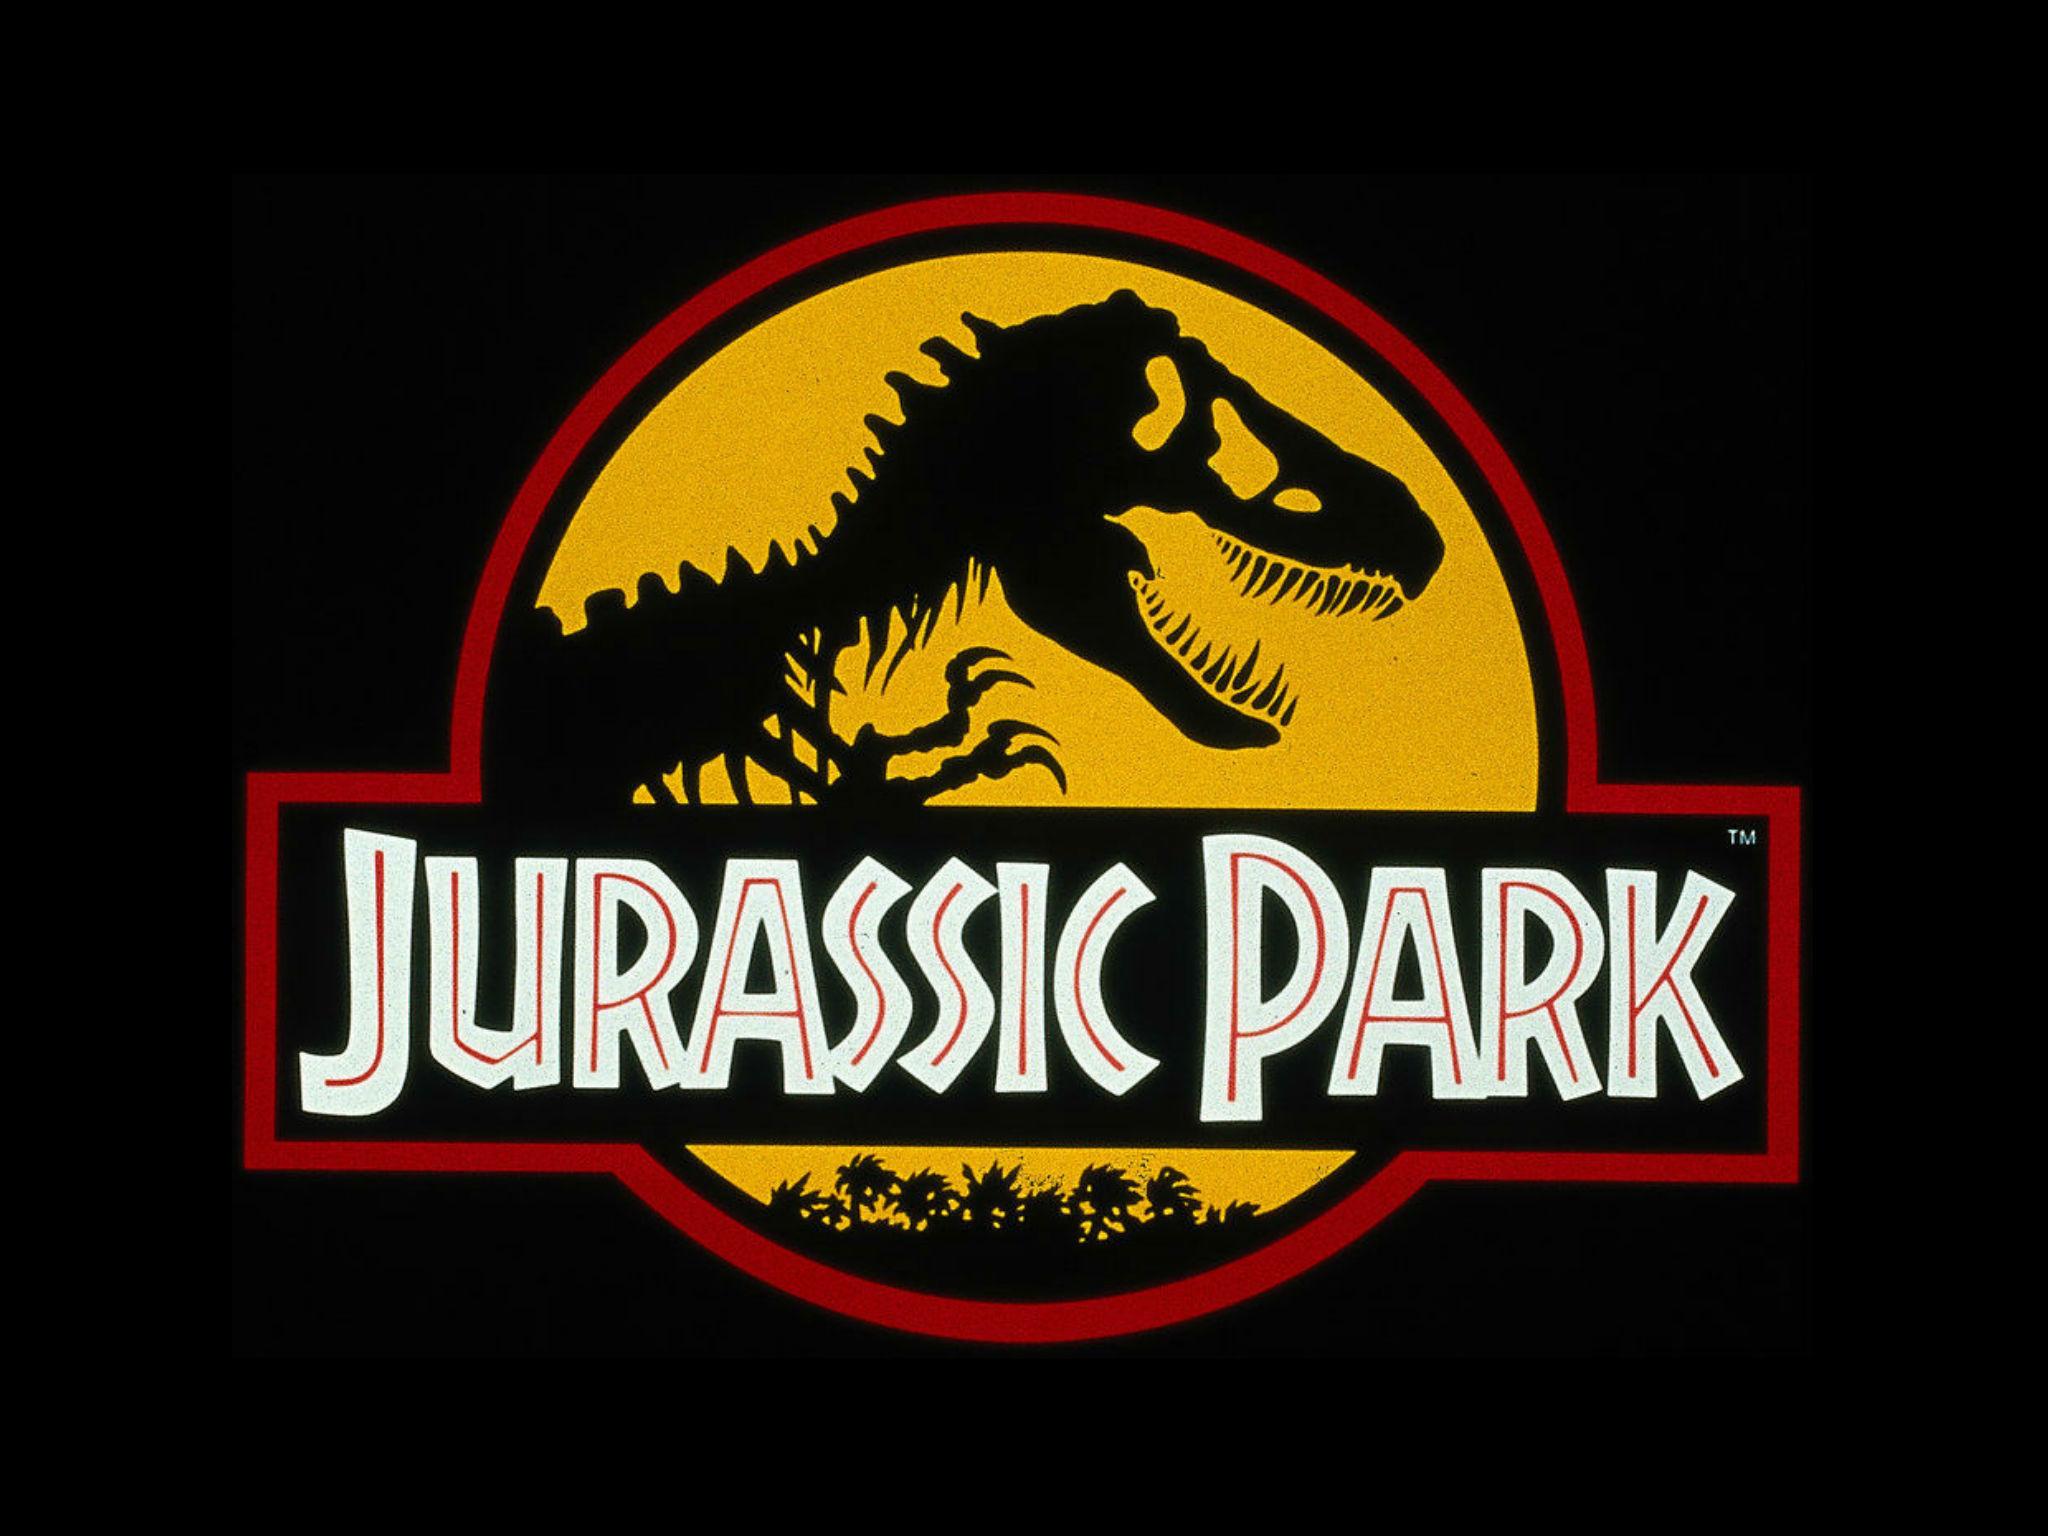 Jurassic Park: Aventura Sinfónica